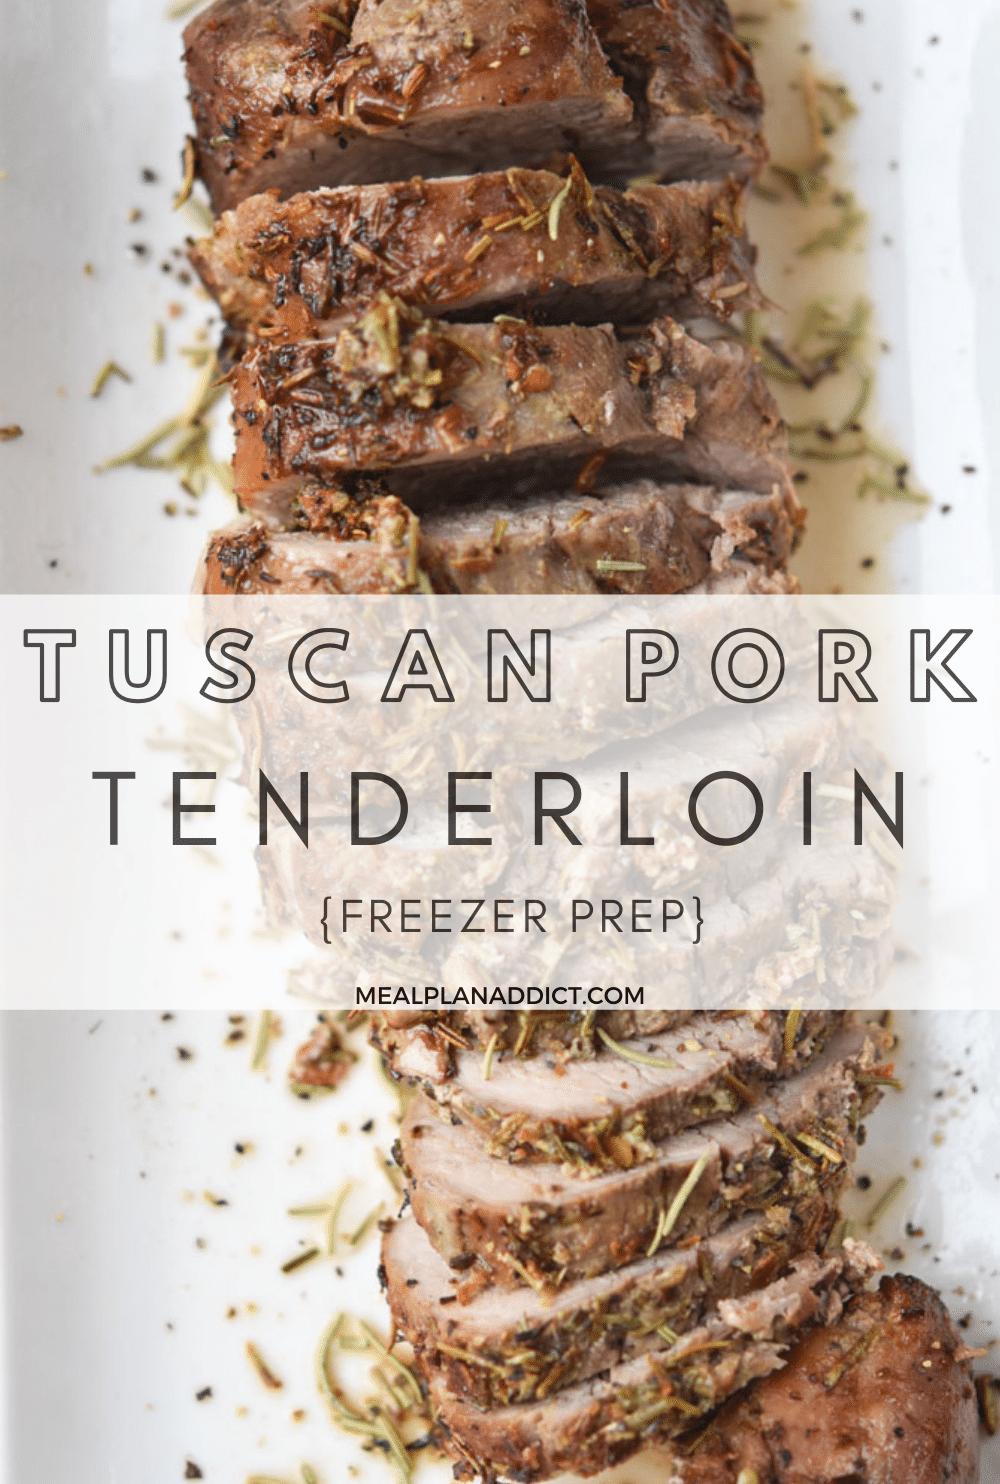 How to Prep Tuscan Pork Tenderloin for the Freezer   Meal Plan Addict